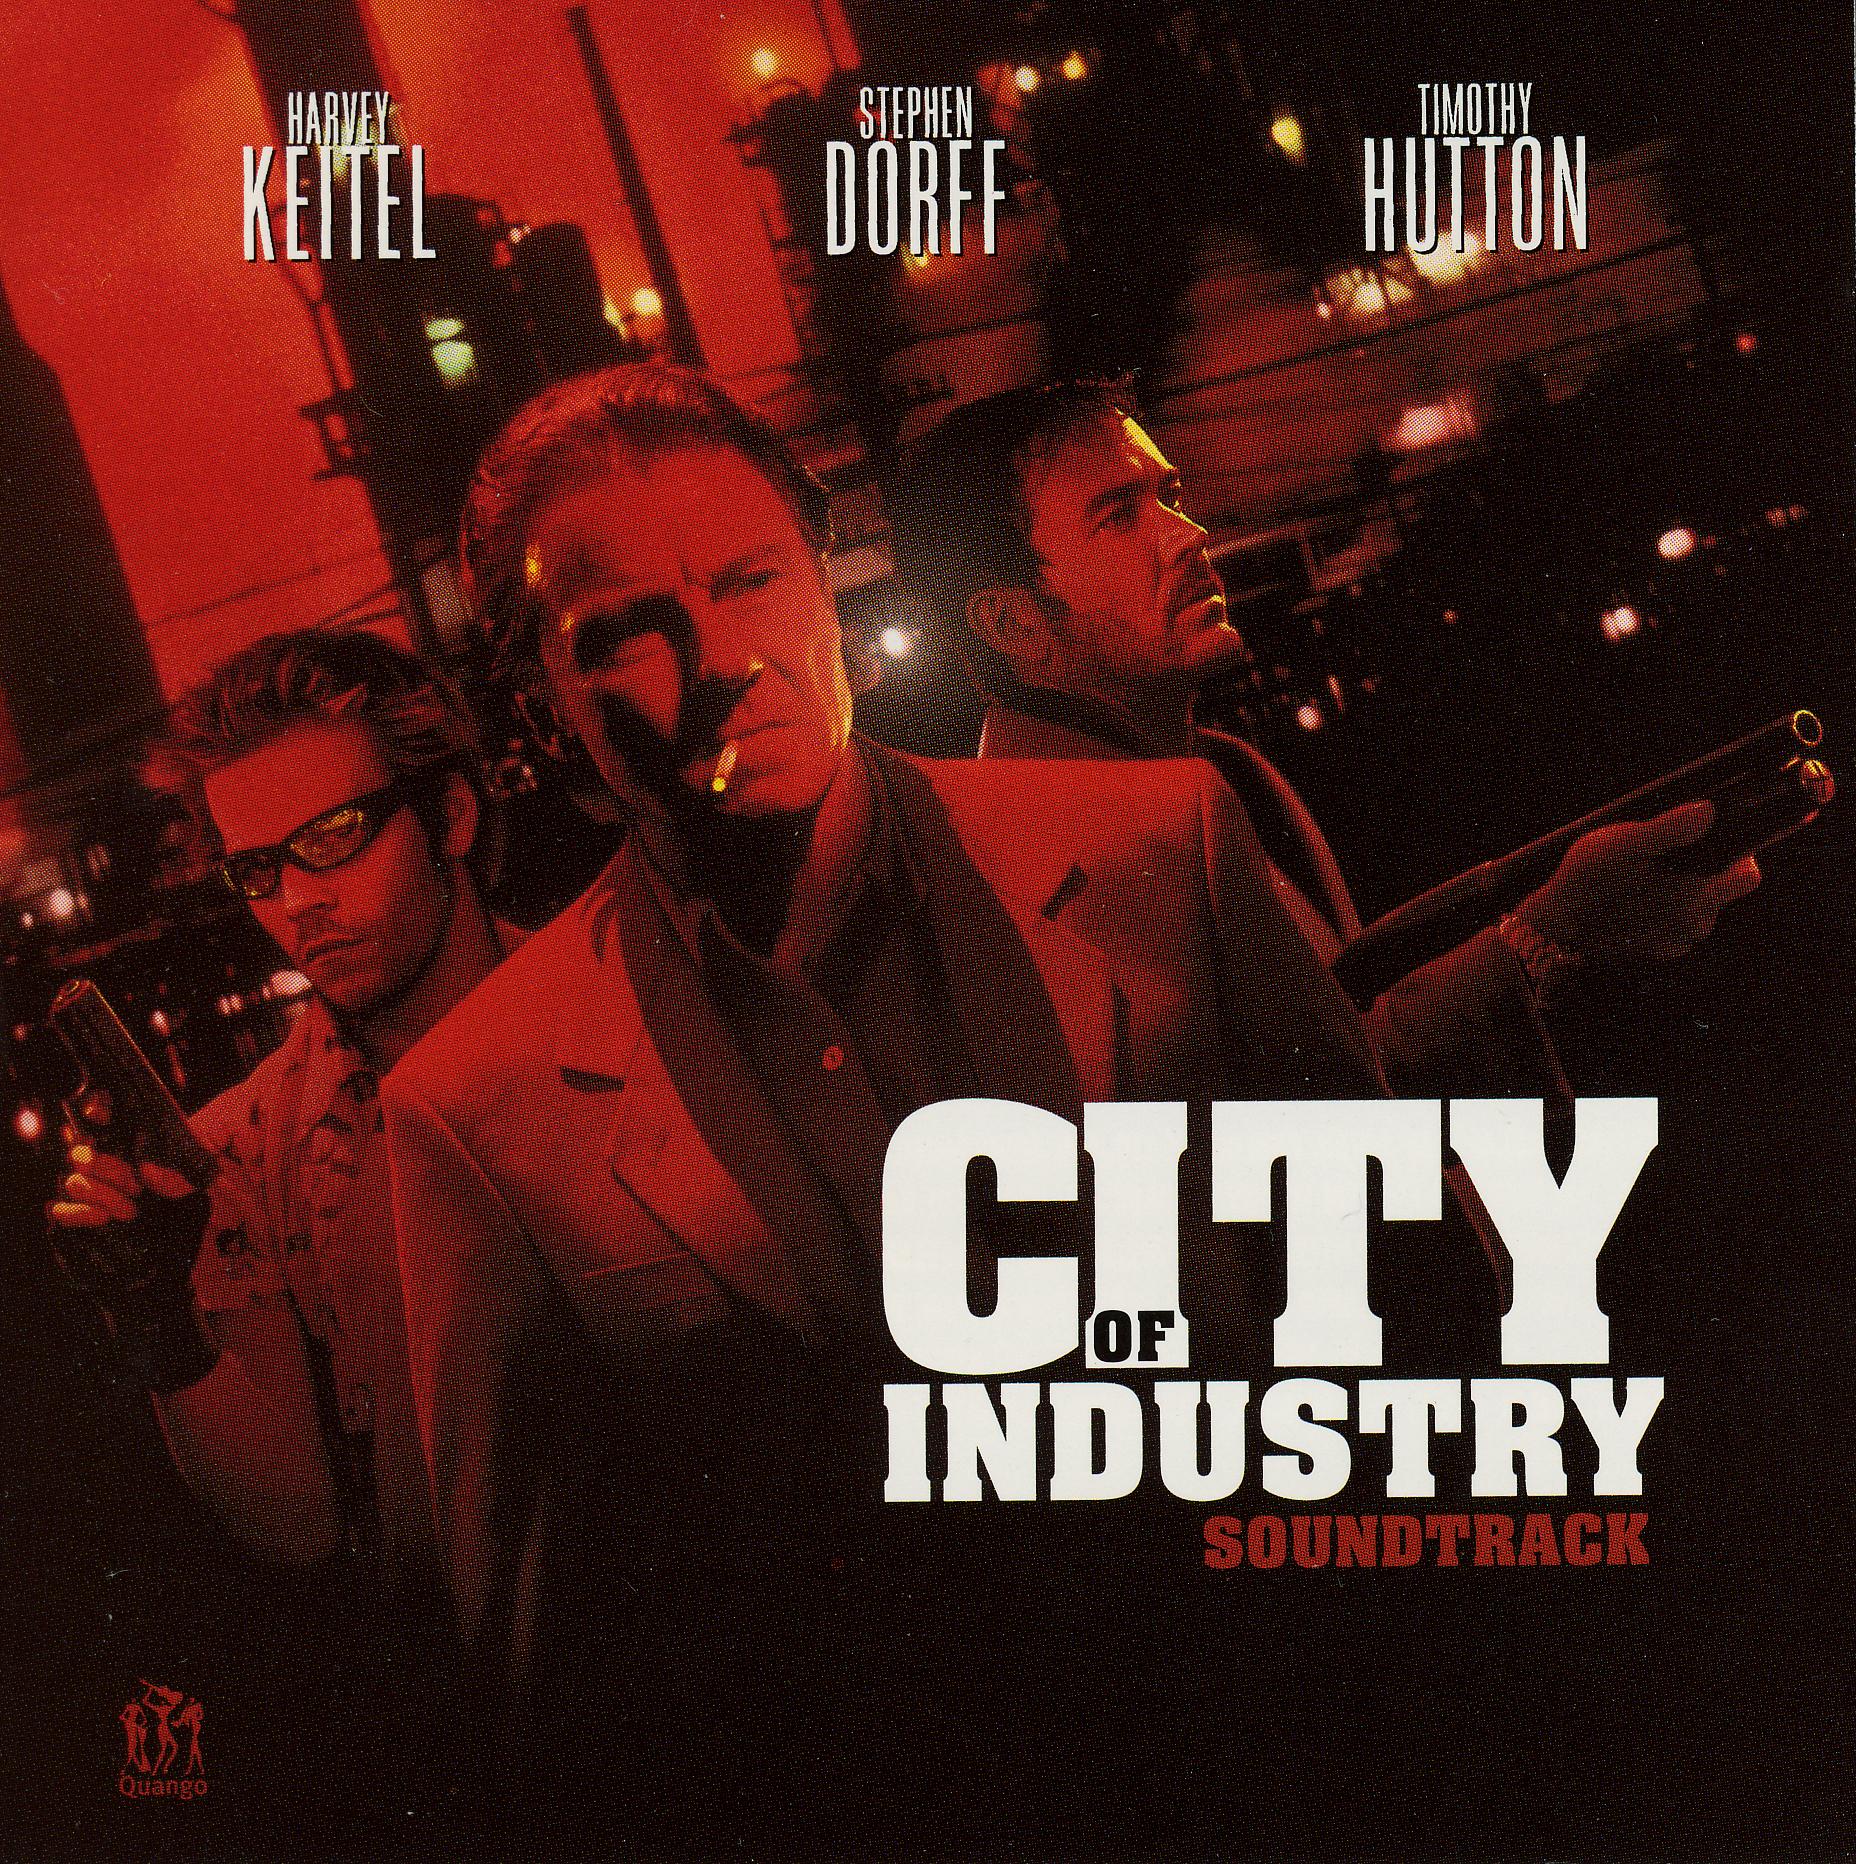 City-Of-Industry-Soundtrack.jpg